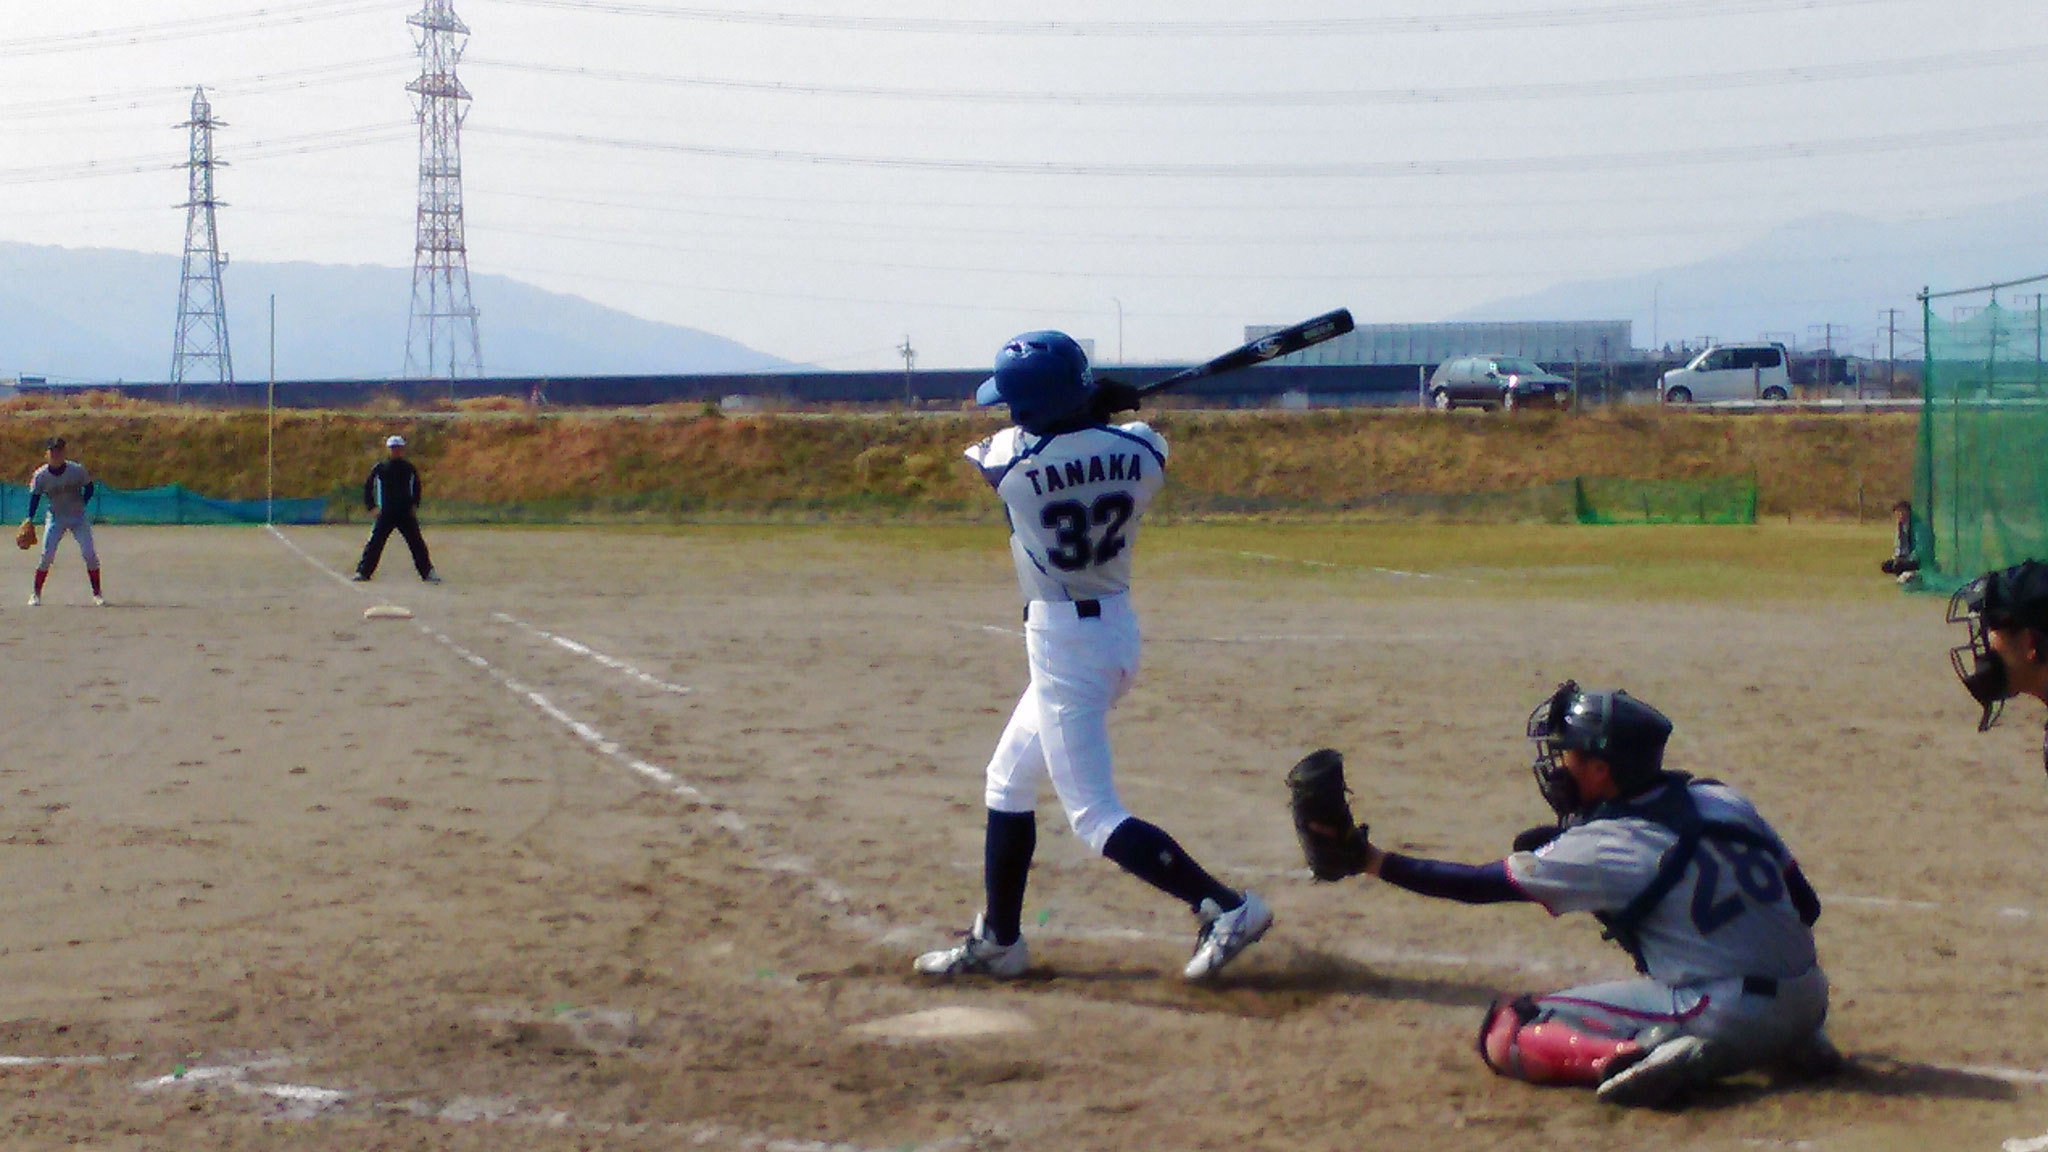 32 Tanaka Syota